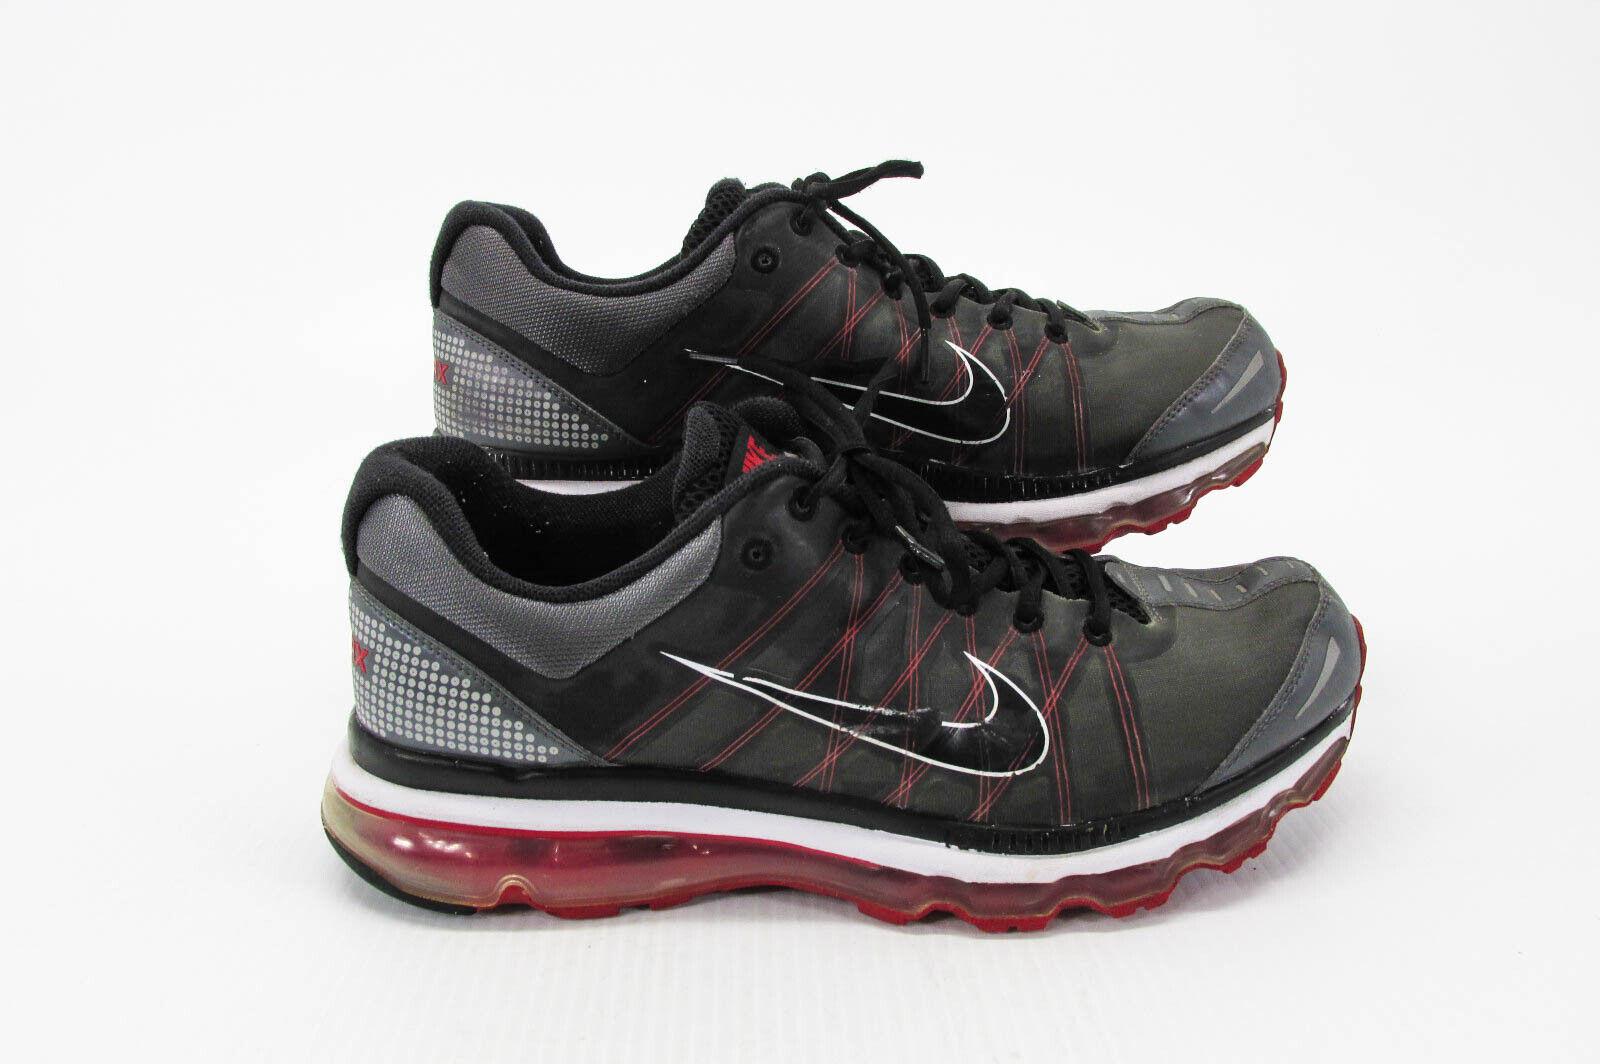 Limón Arrastrarse Skalk  Nike Air Max 2010 Men Athletic Running Shoes Size 13 Pre Owned 396358-005  for sale online | eBay